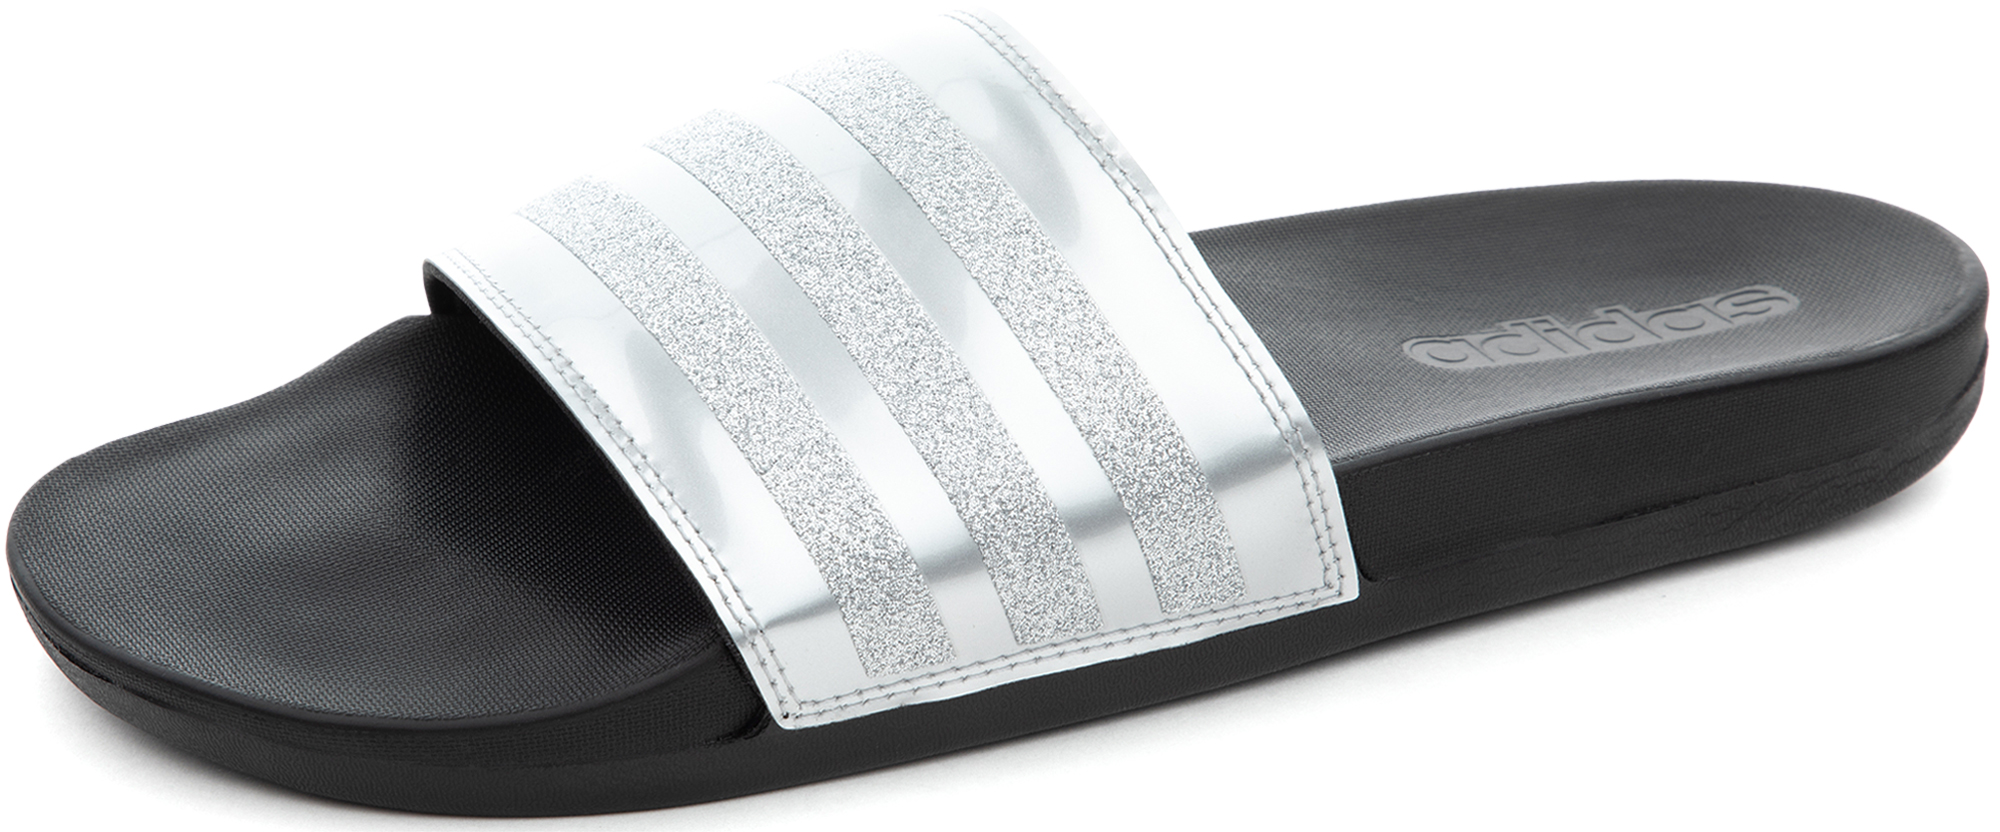 Adidas Шлепанцы женские Adidas Adilette Comfort, размер 40,5 цена в Москве и Питере